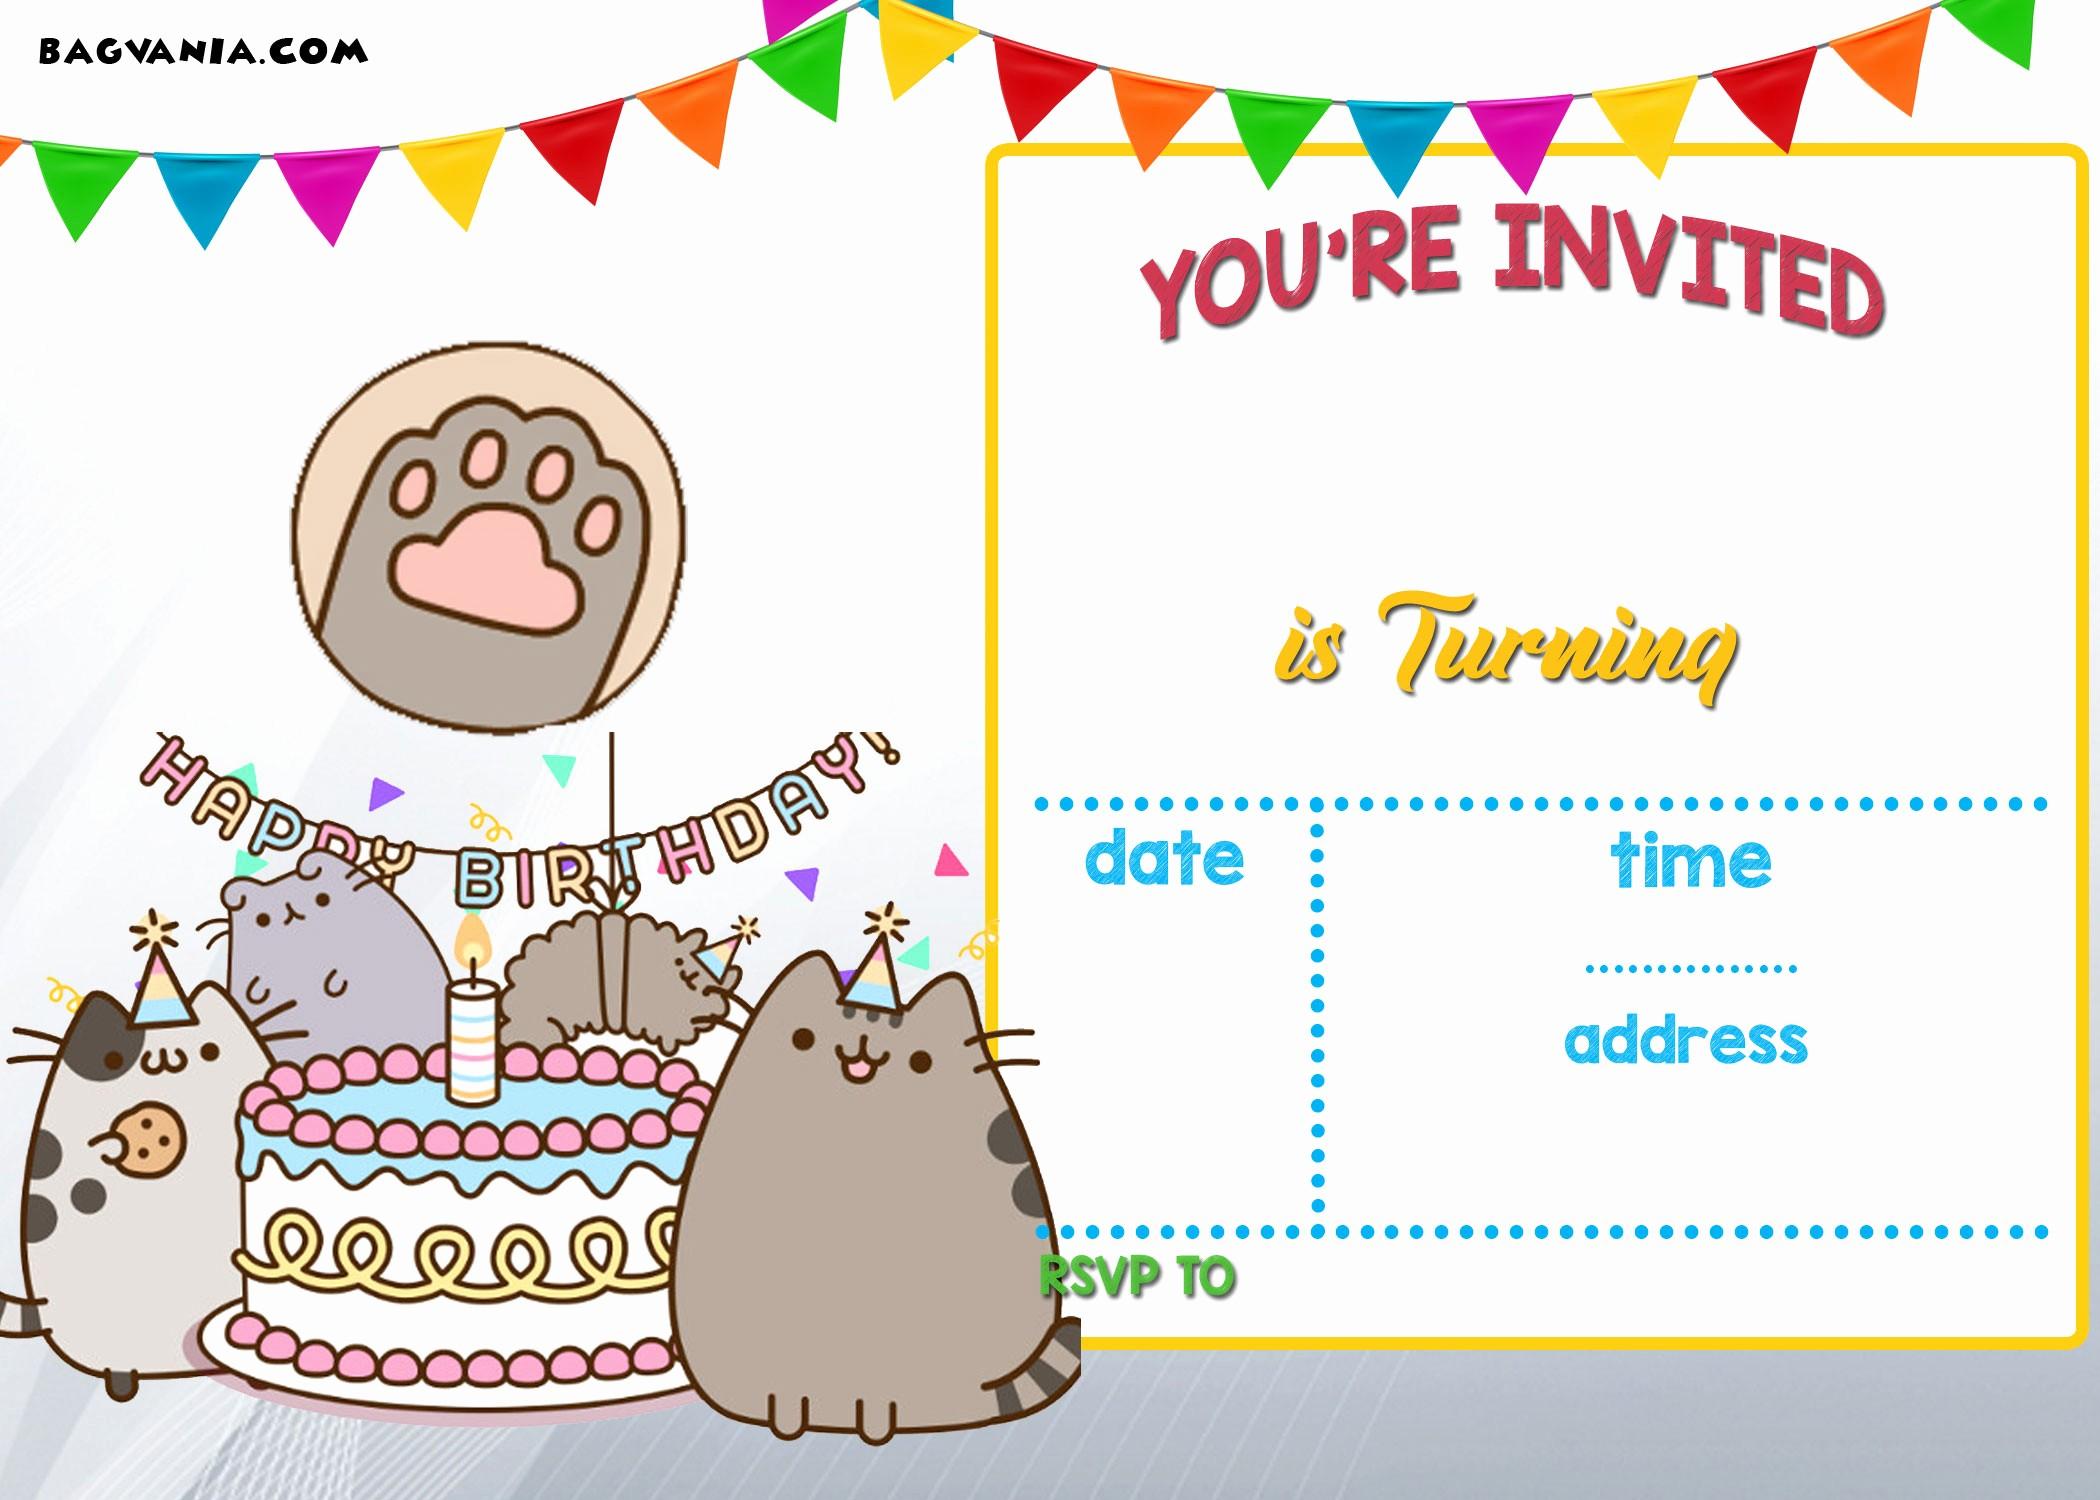 Free Templates for Birthday Invitations New Free Printable Pusheen Birthday Invitation Template